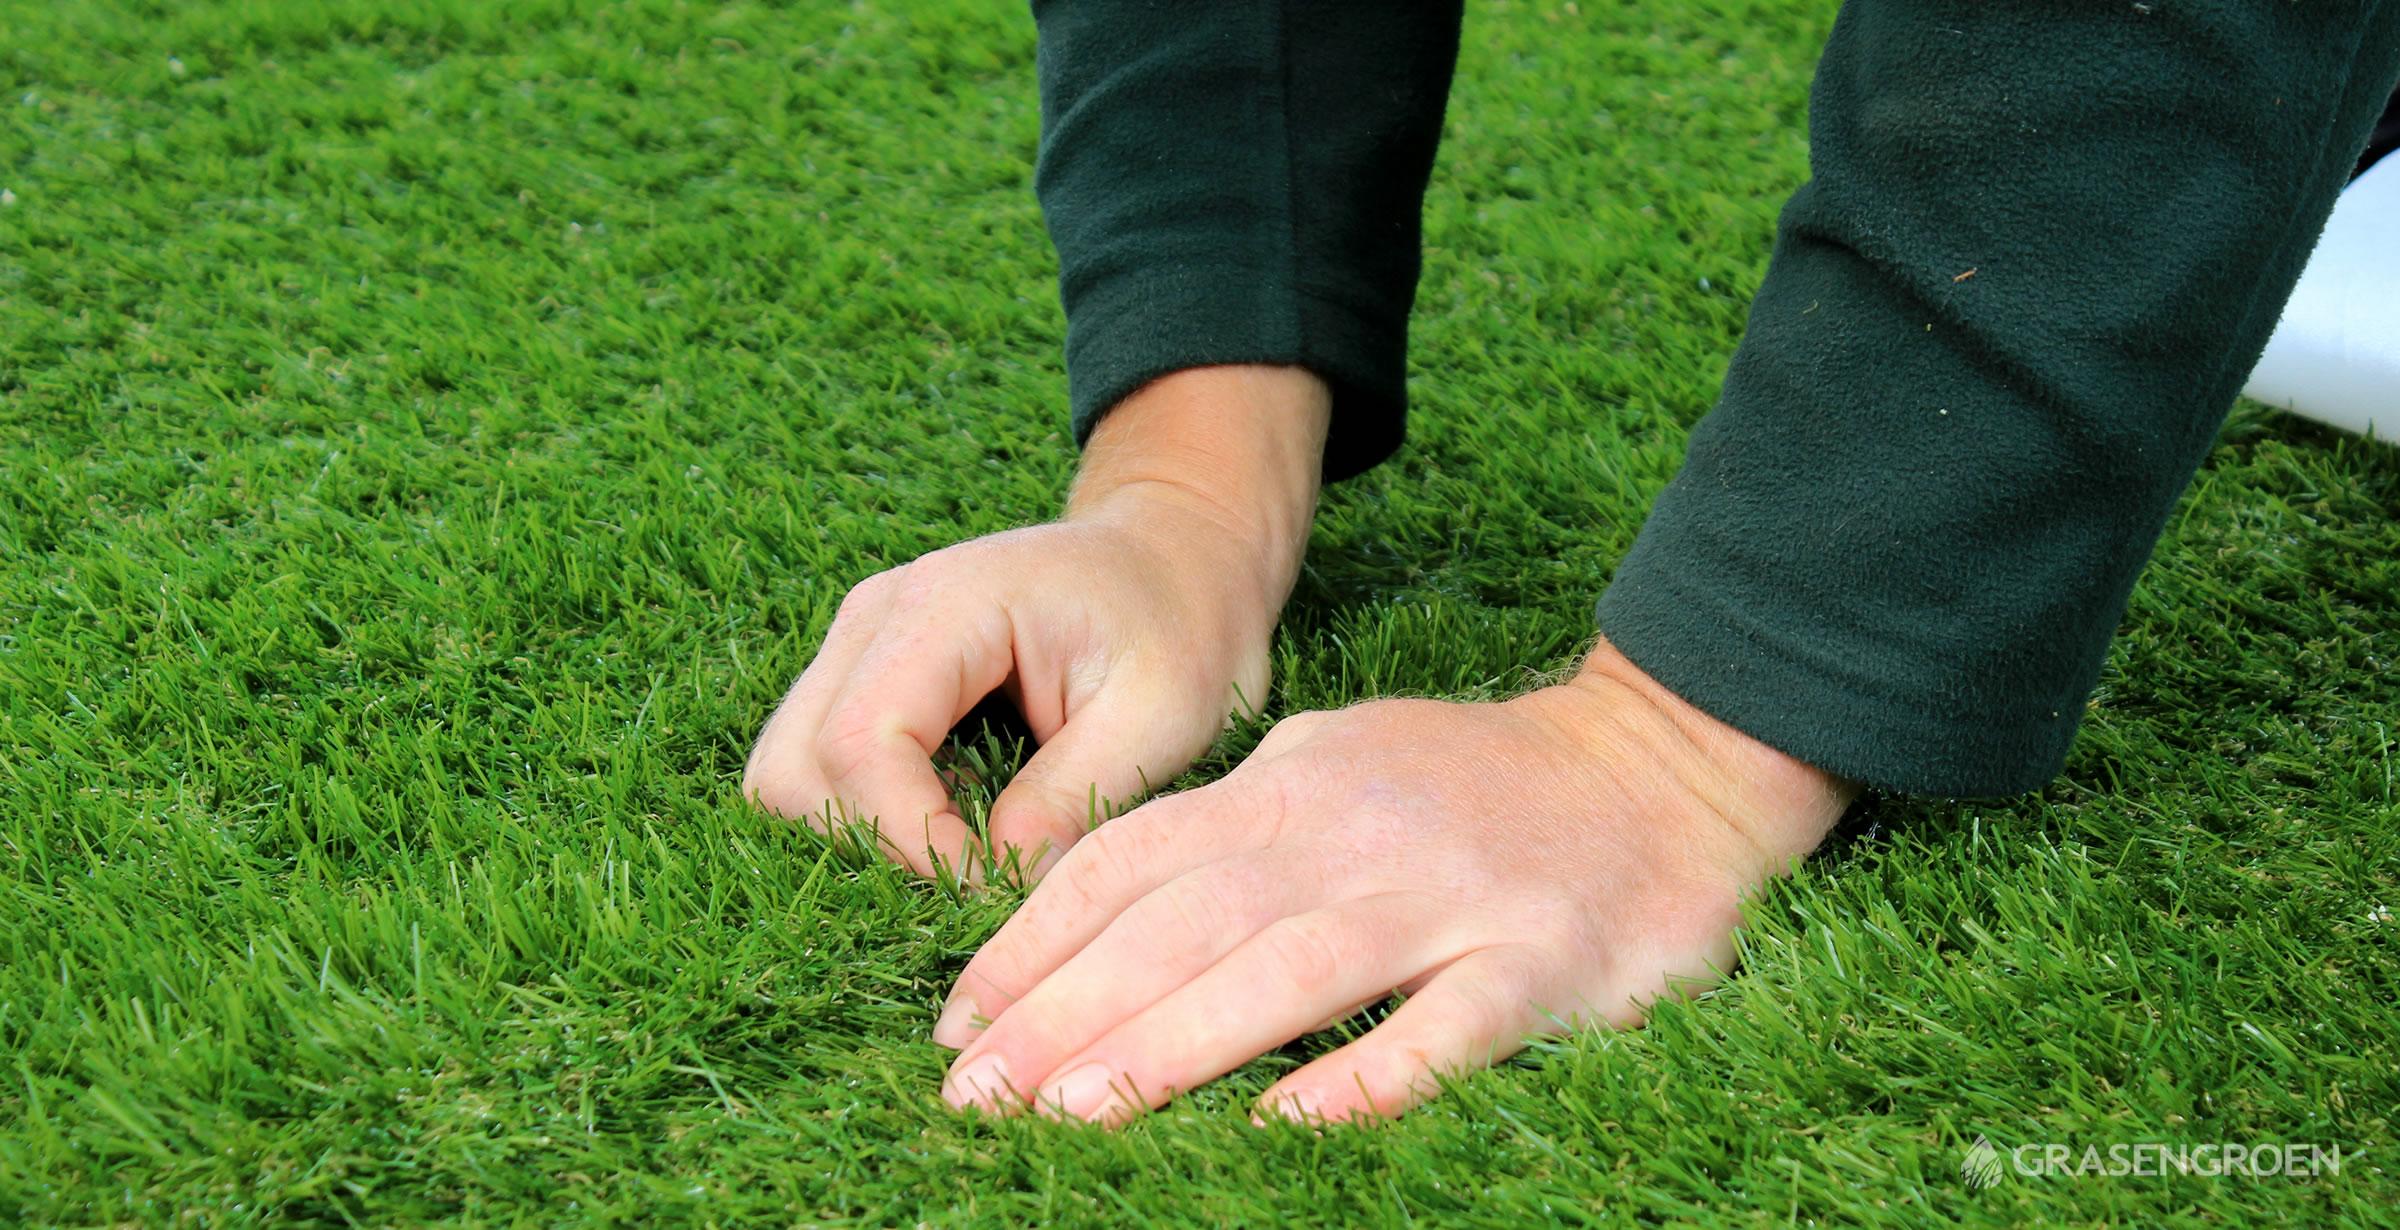 Kunstgrasleggenverlijmenslider4 • Gras en Groen Kunstgras